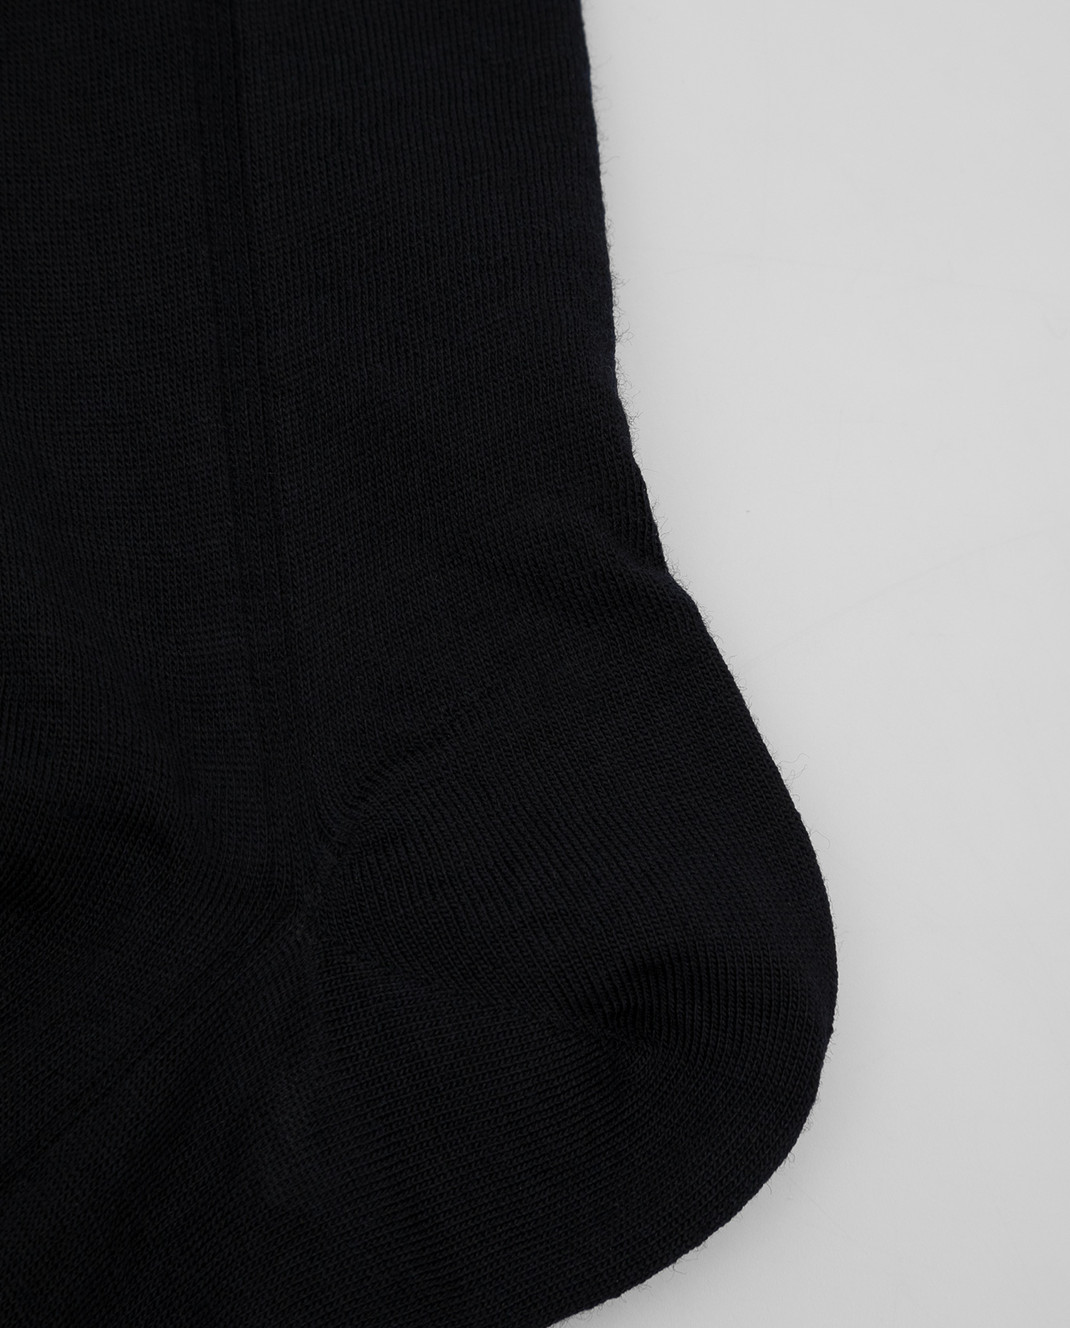 RiminiVeste Темно-синие носки из шерсти WN8011EMINENCE изображение 3